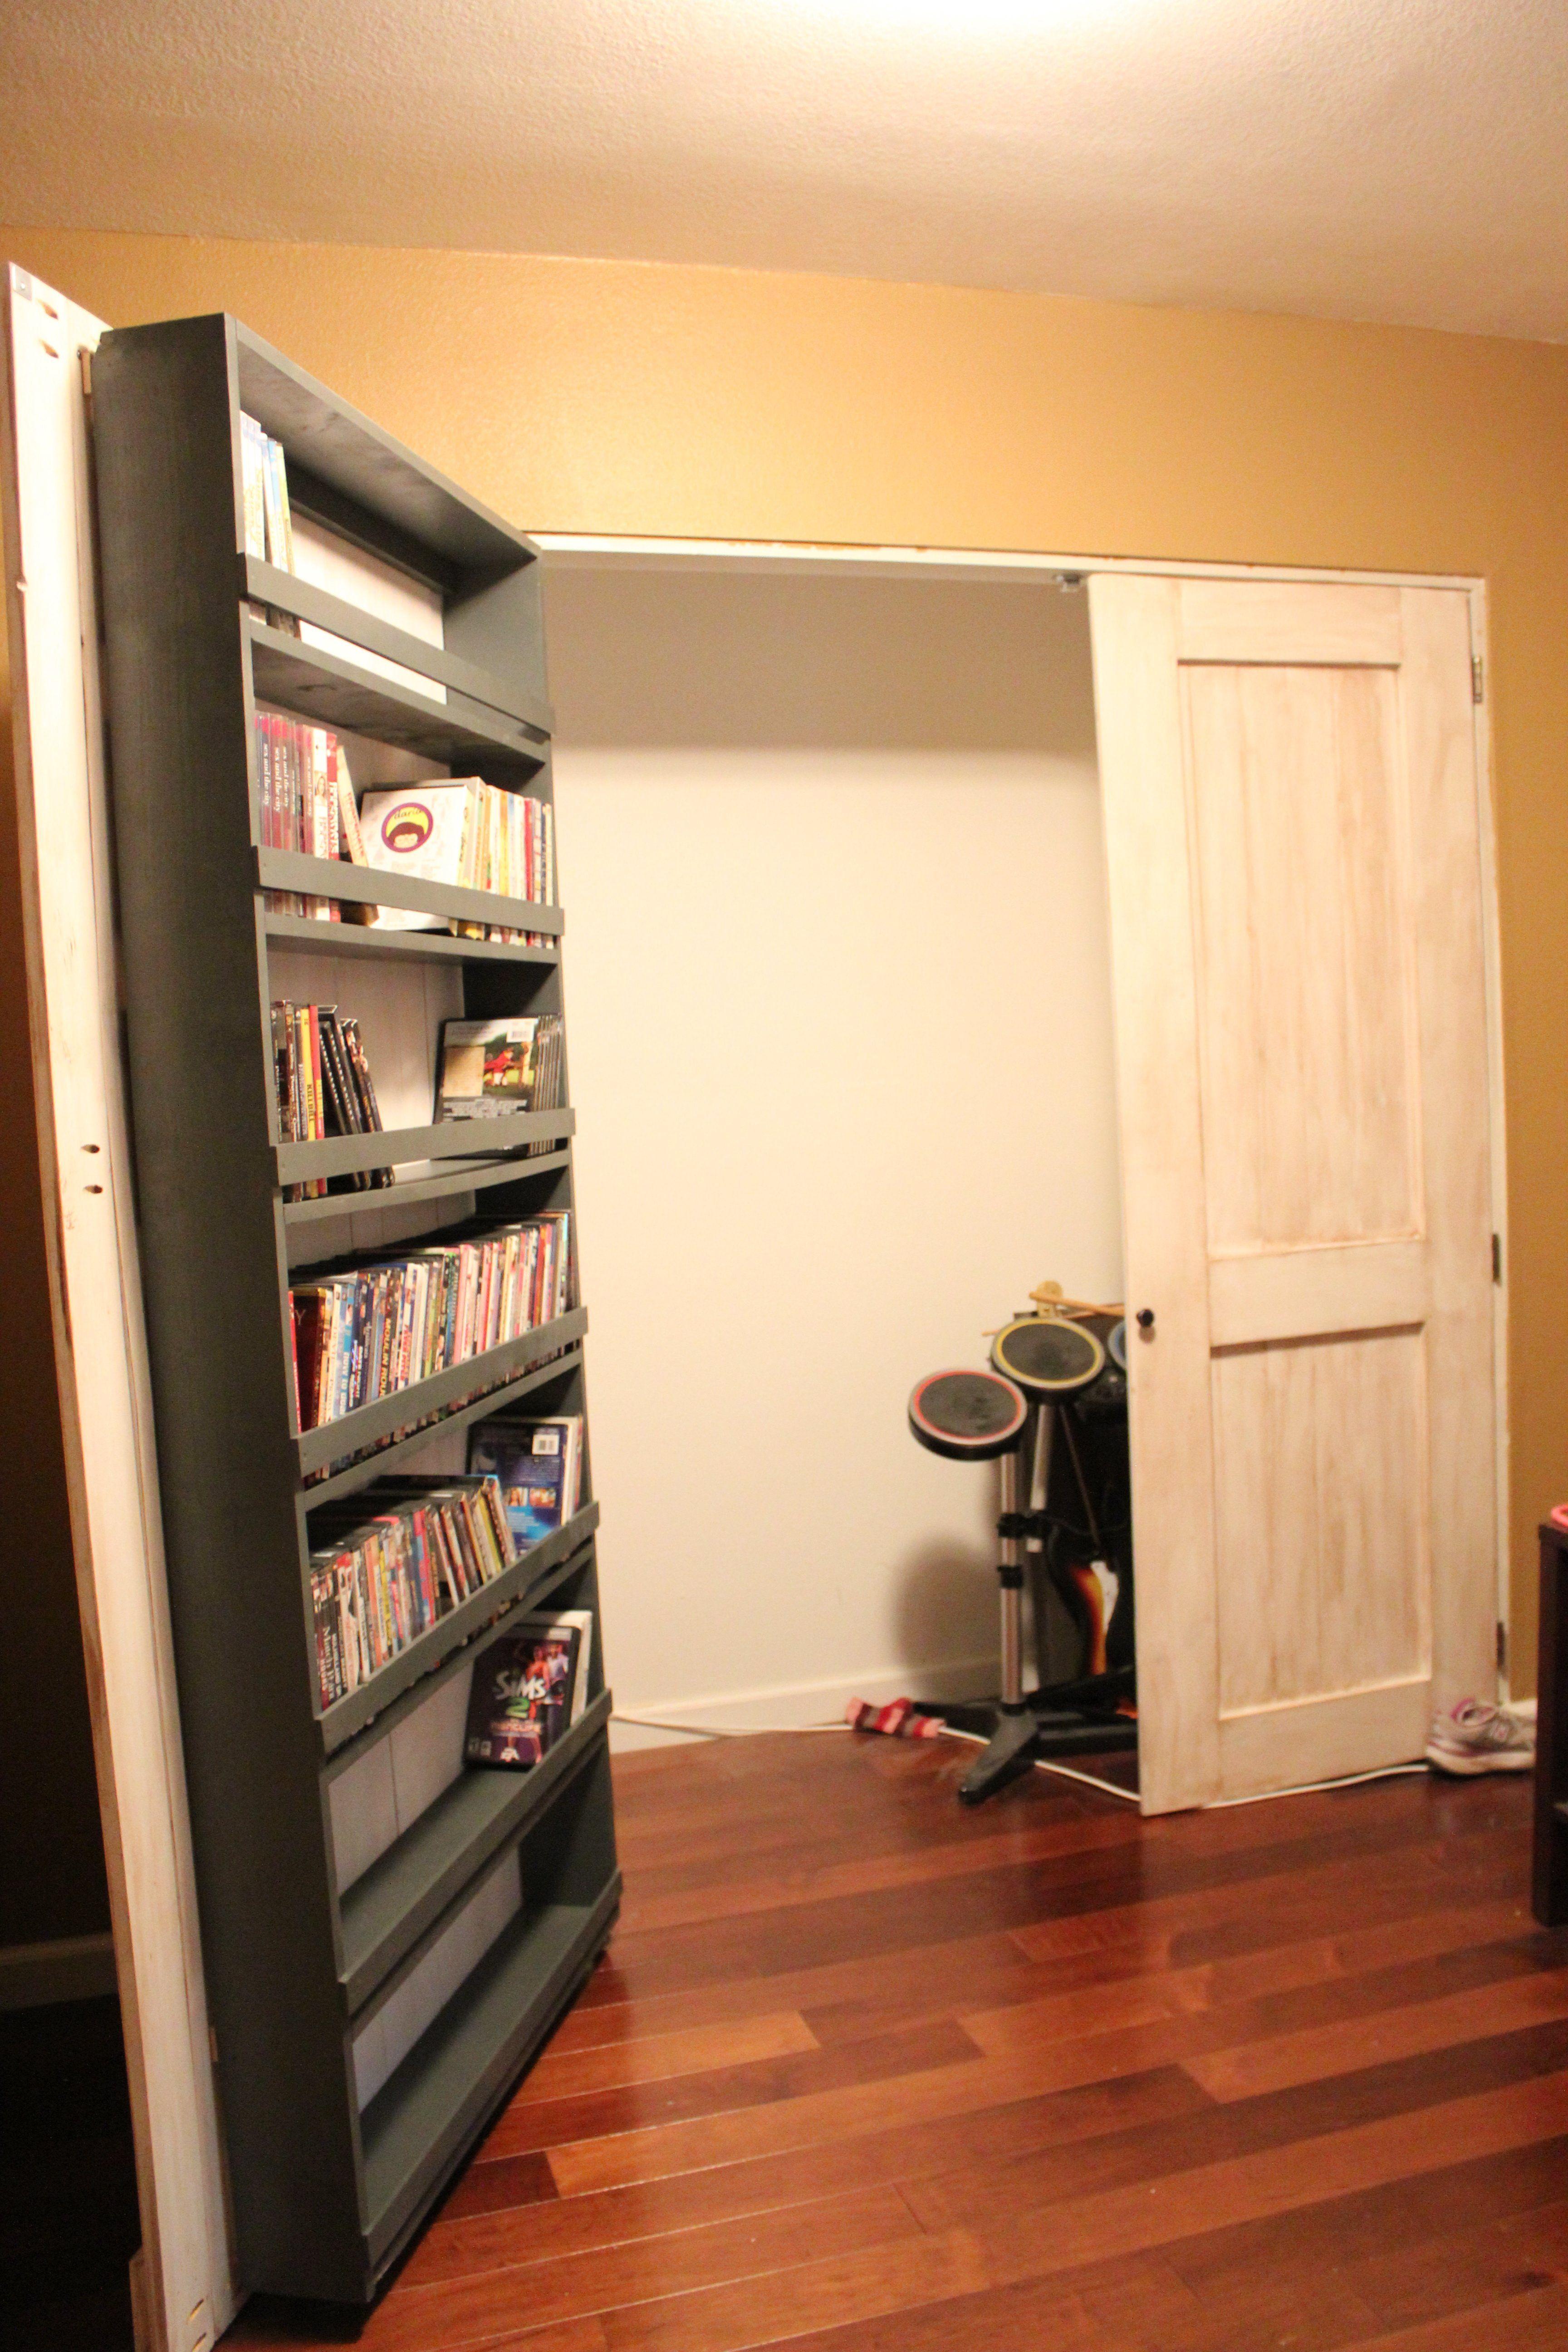 Dvd Shelf Ideas 25 Dvd Storage Ideas You Had No Clue About  Dvd Storage Dvd S